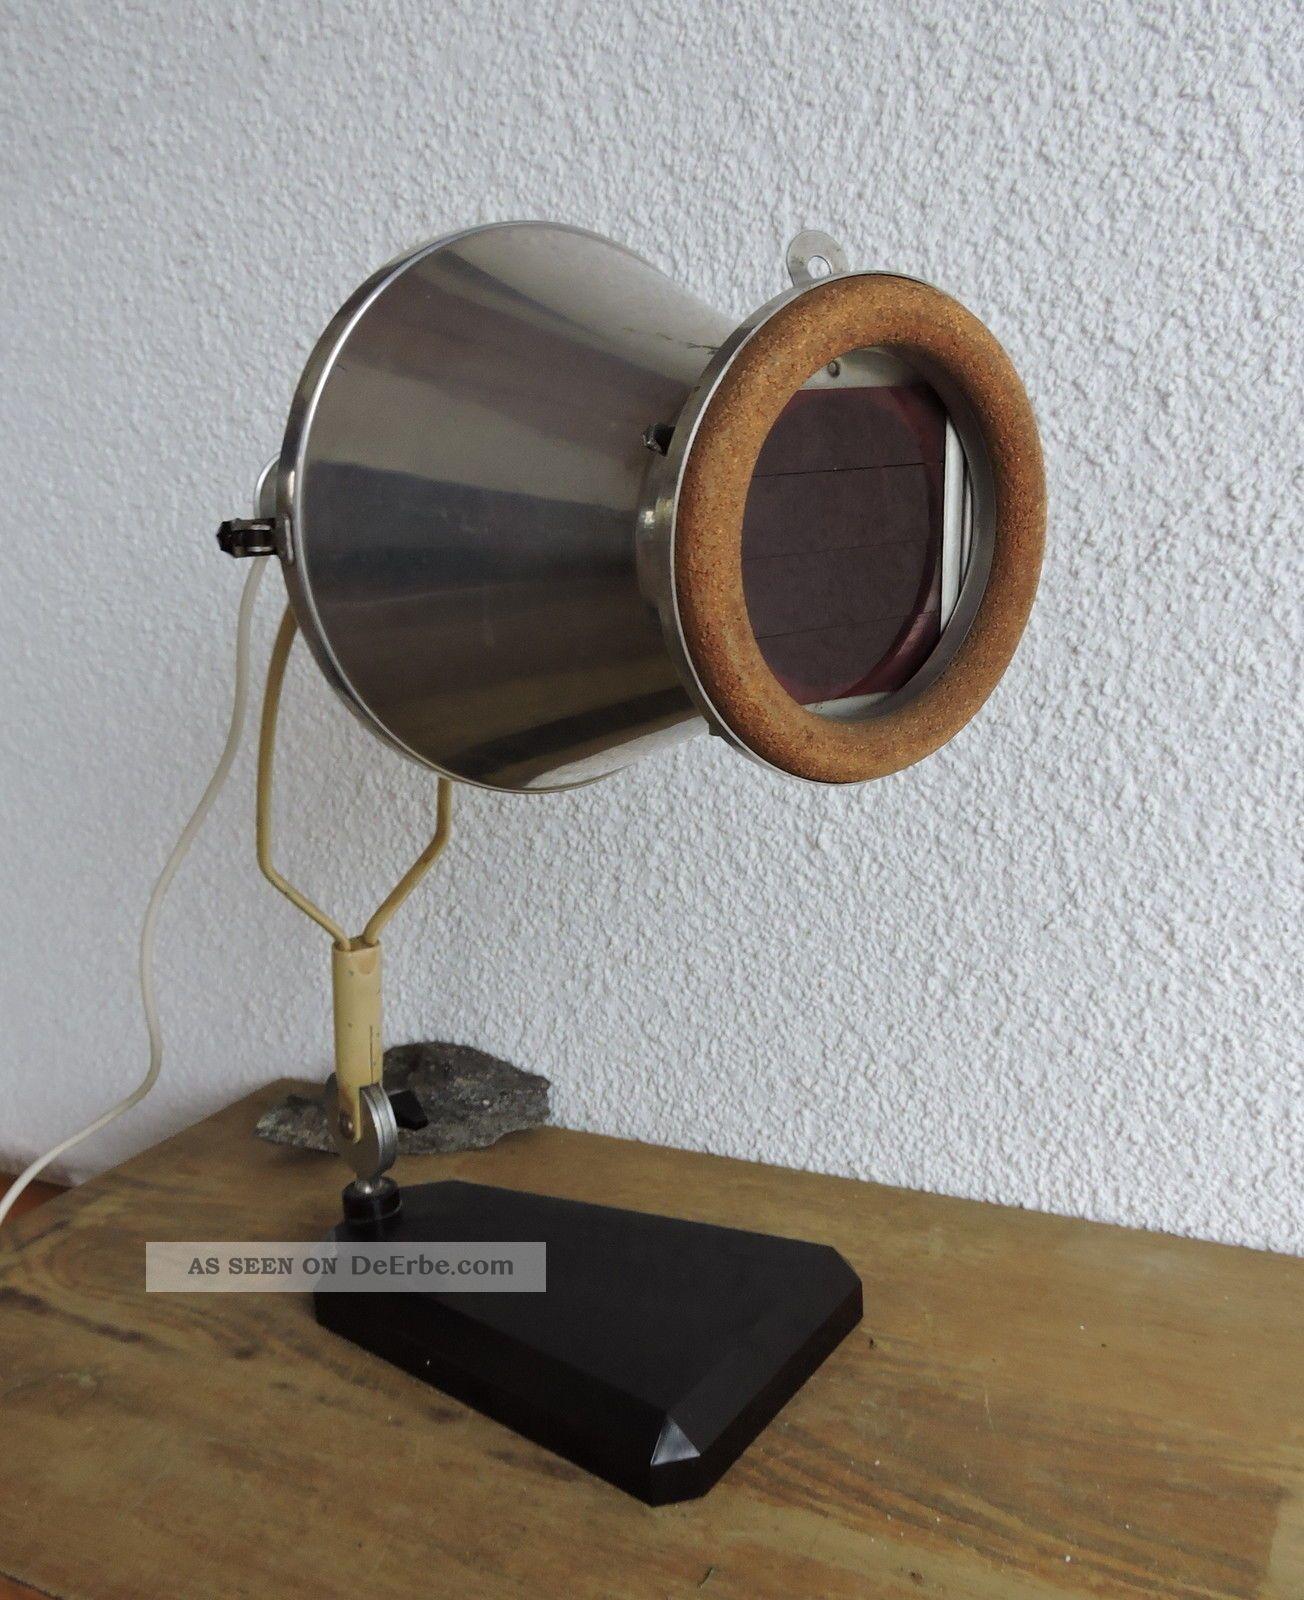 art deco bauhaus sollux hanau lampe w rmelampe arztlampe. Black Bedroom Furniture Sets. Home Design Ideas